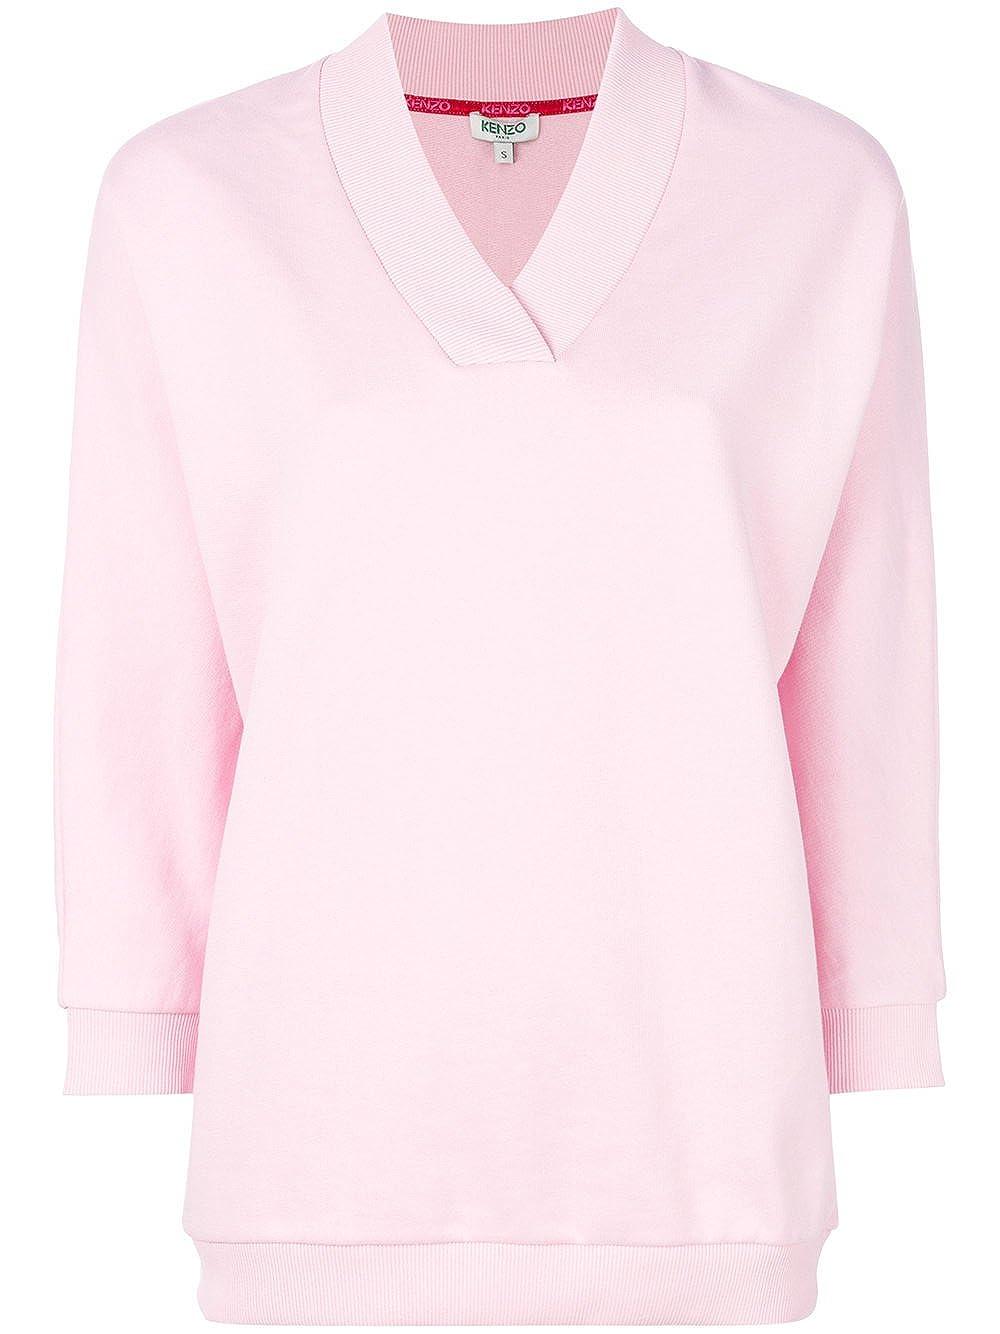 Kenzo -Chaqueta deportiva Mujer Rosa Marke Talla M: Amazon ...